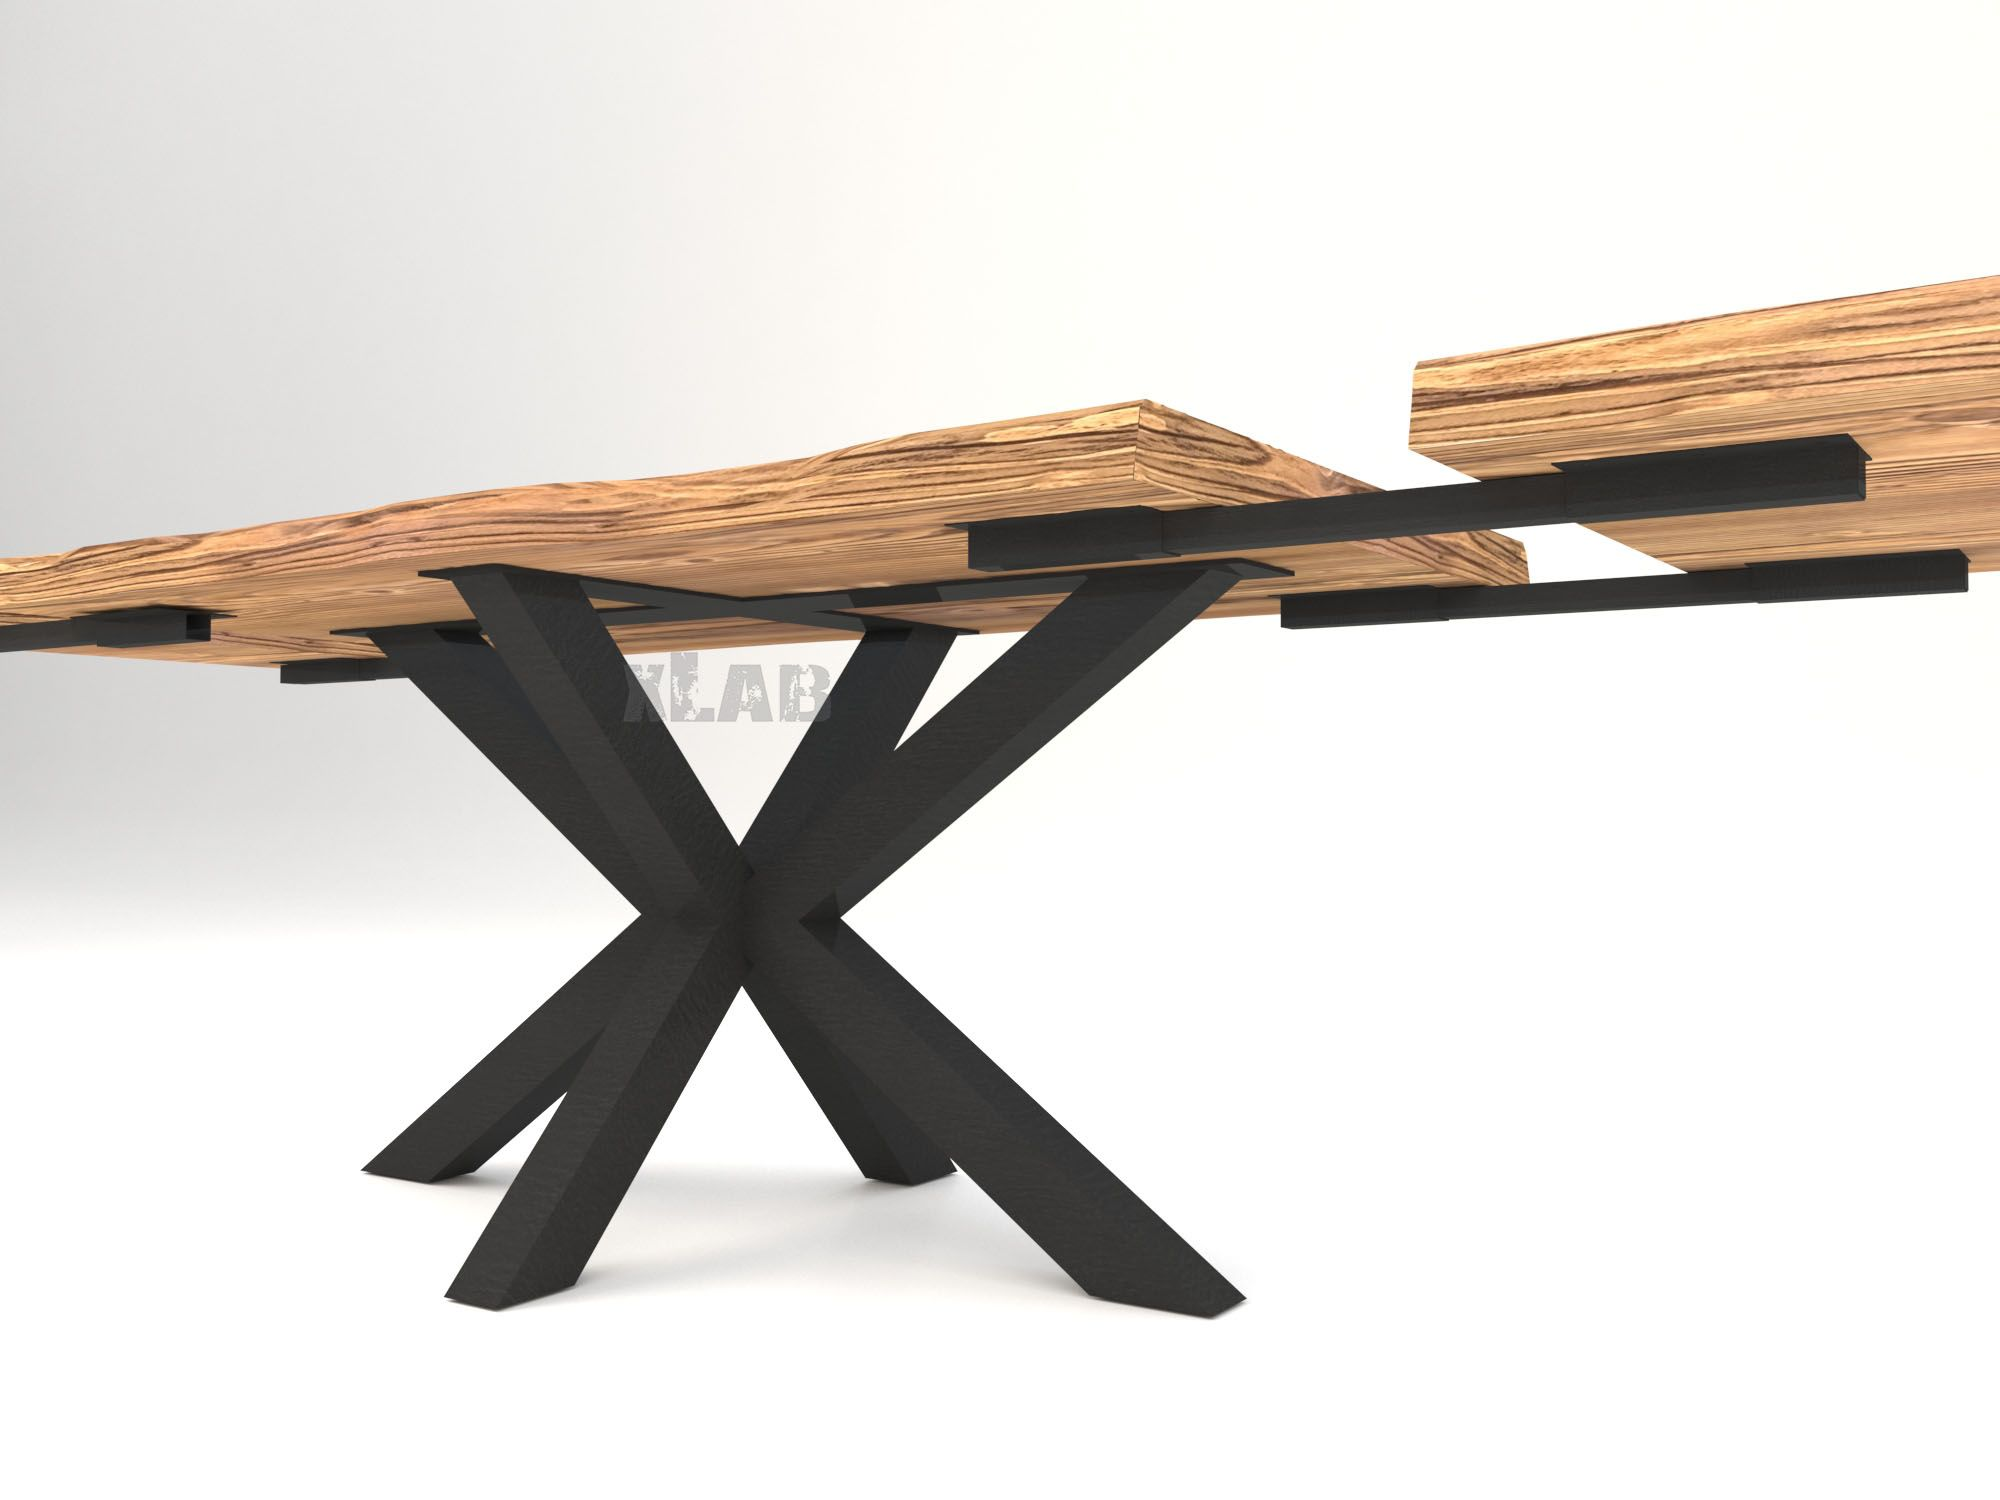 Offerte Tavoli Allungabili Legno.Tavolo Da Pranzo Allungabile Jeff In Offerta Su Xlab Tavoli Da